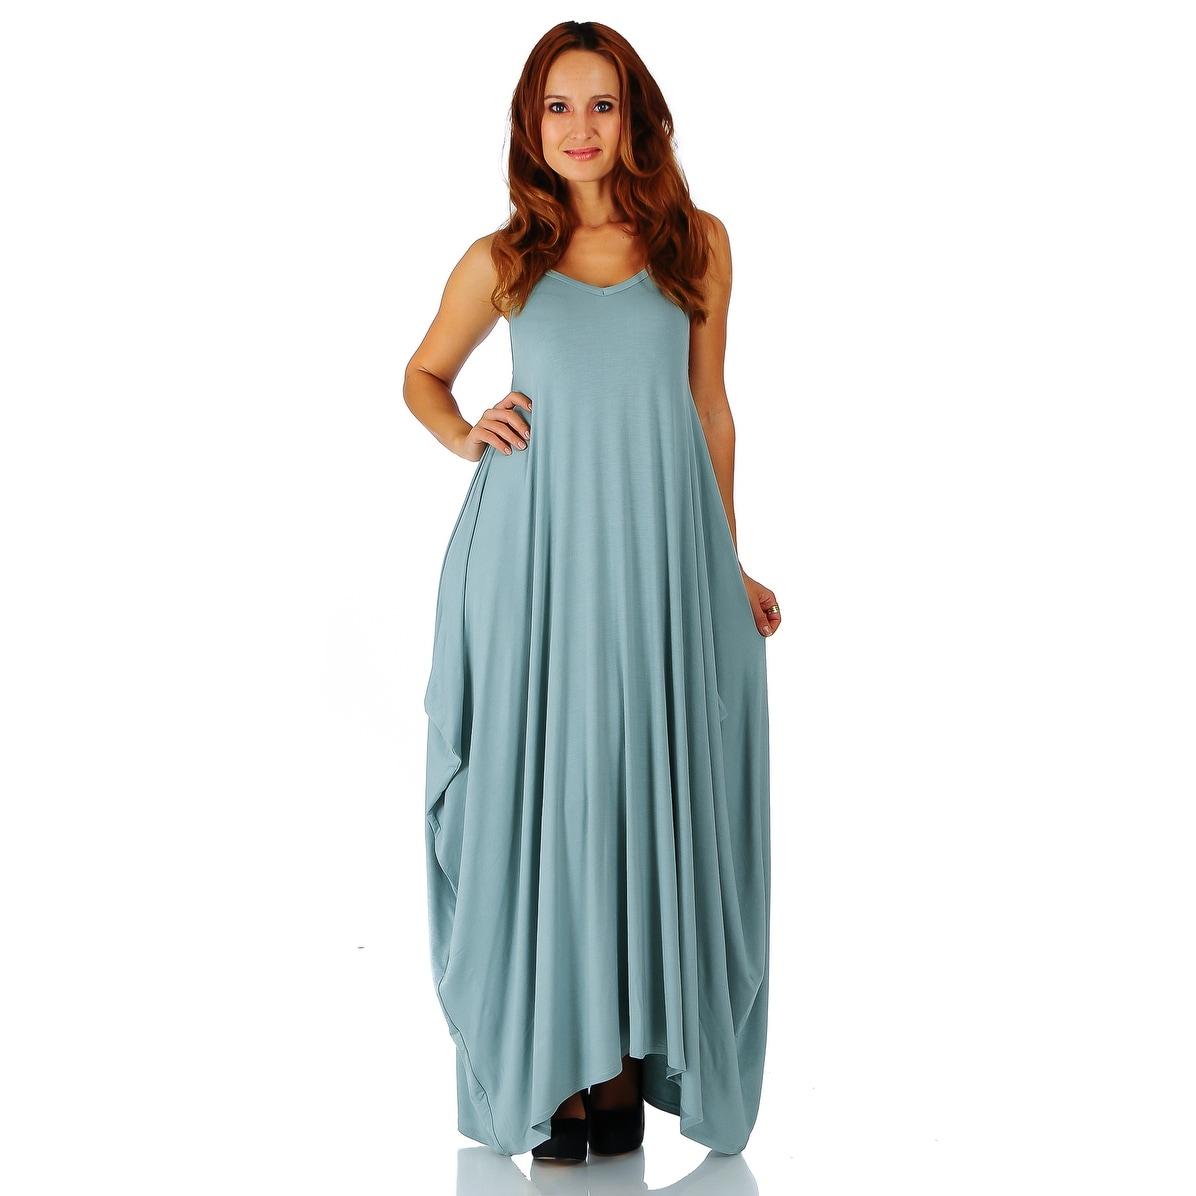 f88d15d6a57fb Buy Long Casual Dresses Online at Overstock | Our Best Dresses Deals